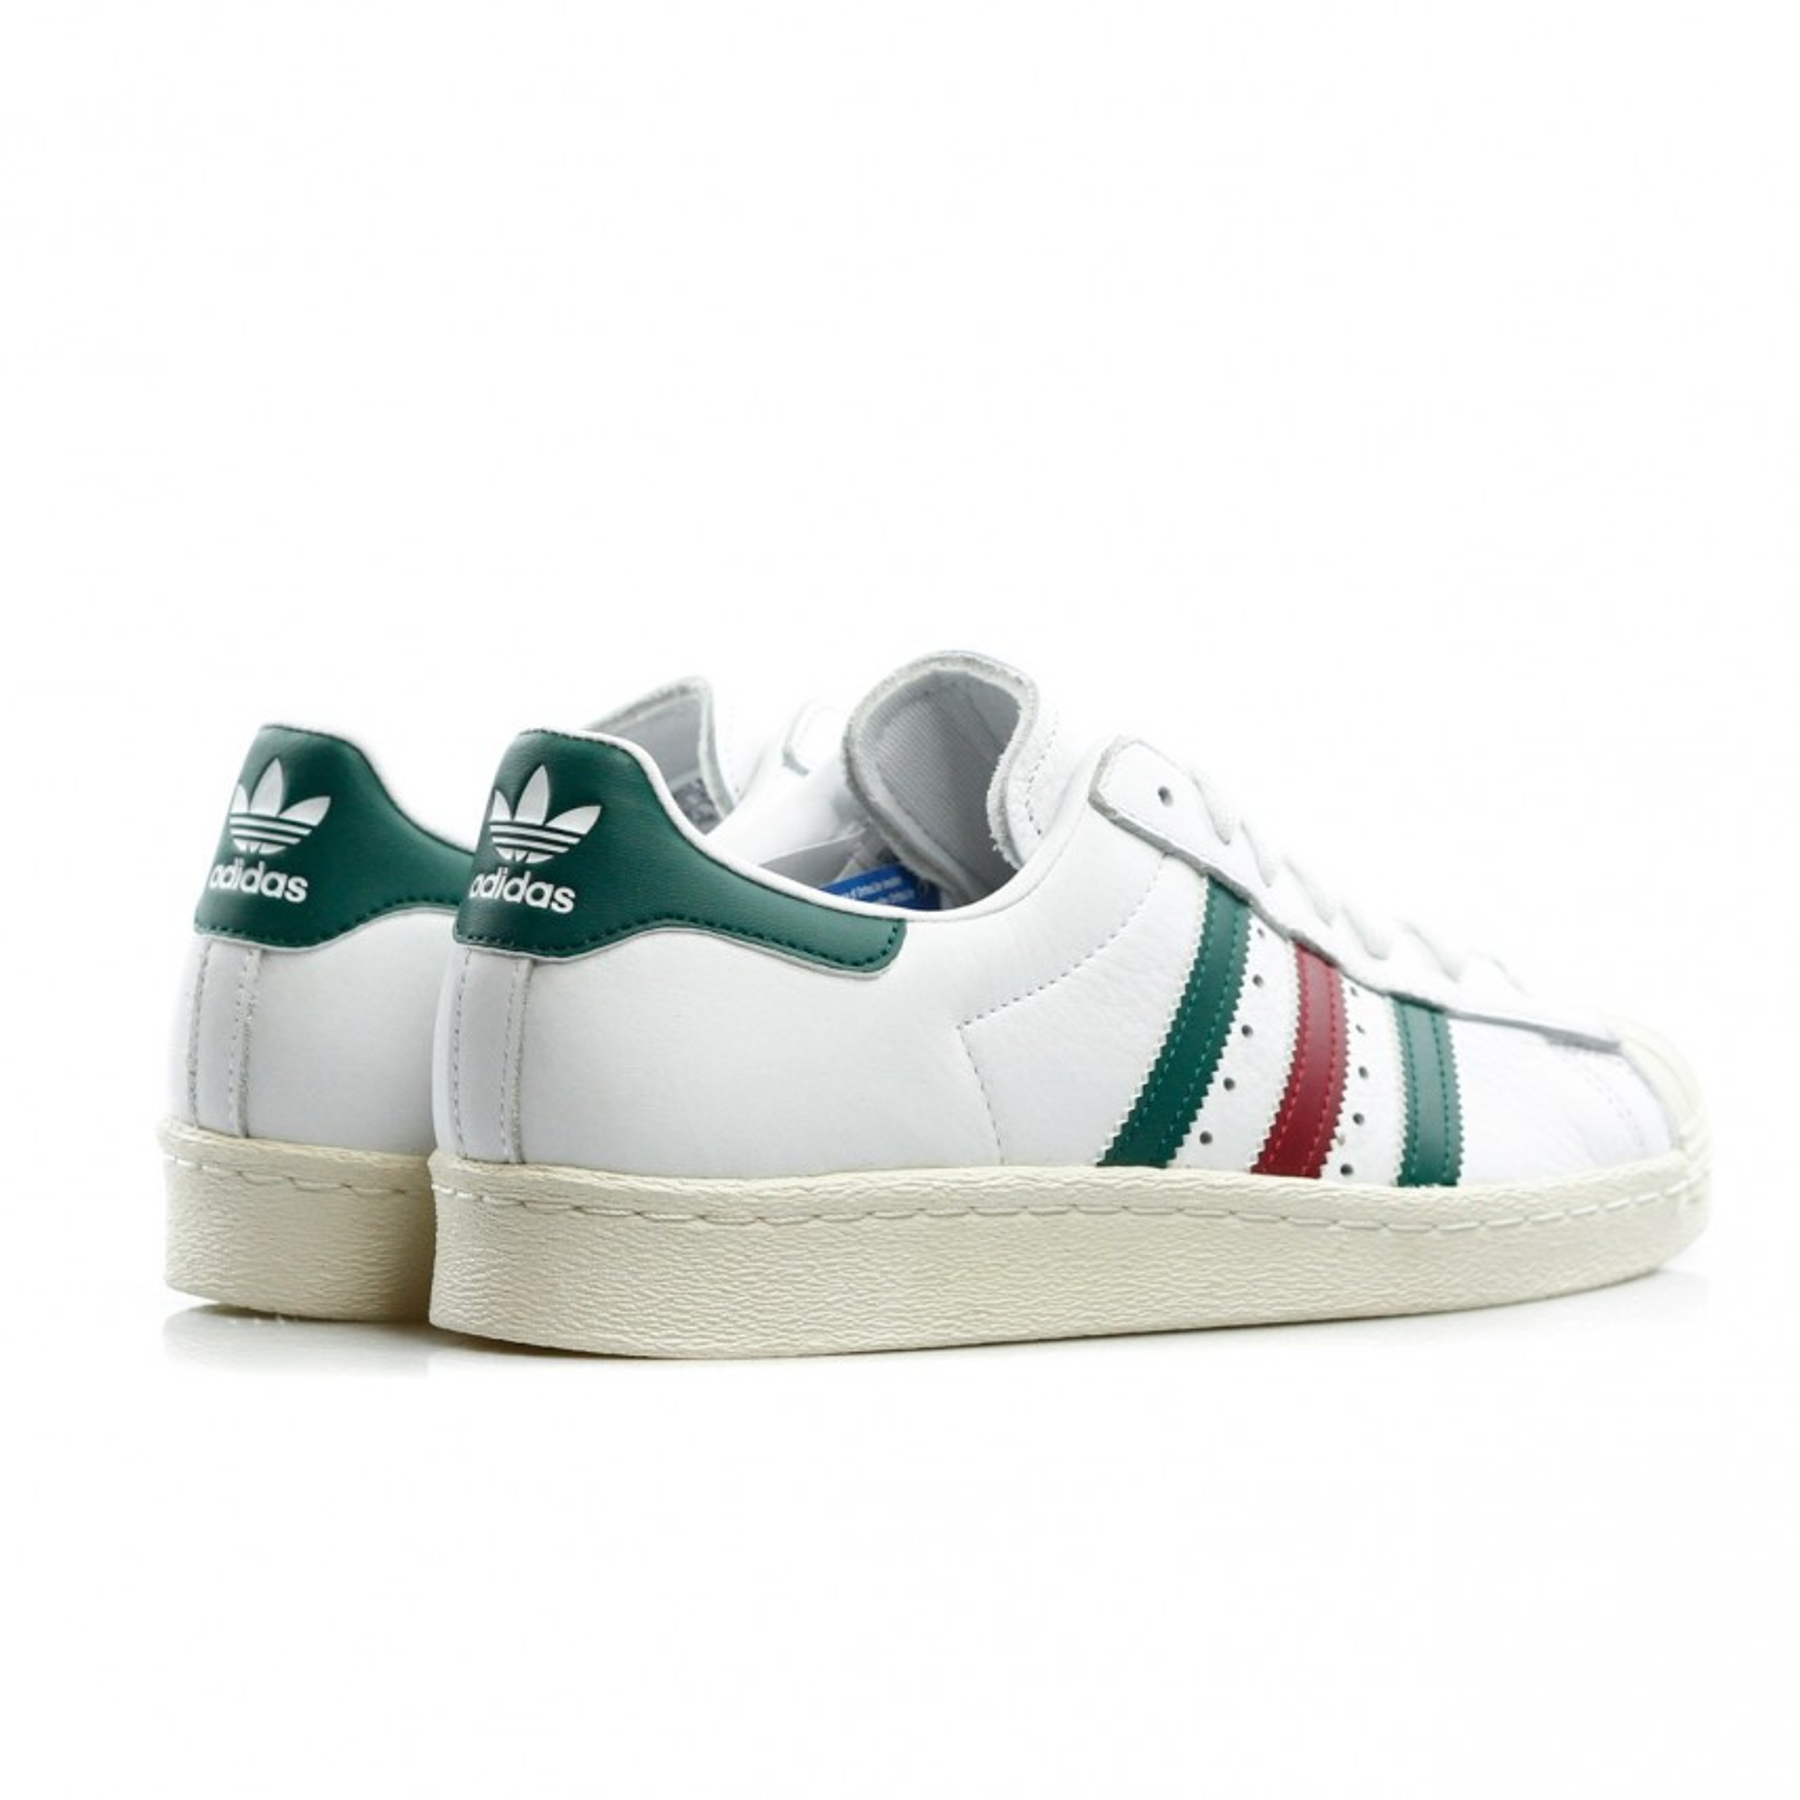 Adidas Superstar 80s Trainers WhiteGreenRuby